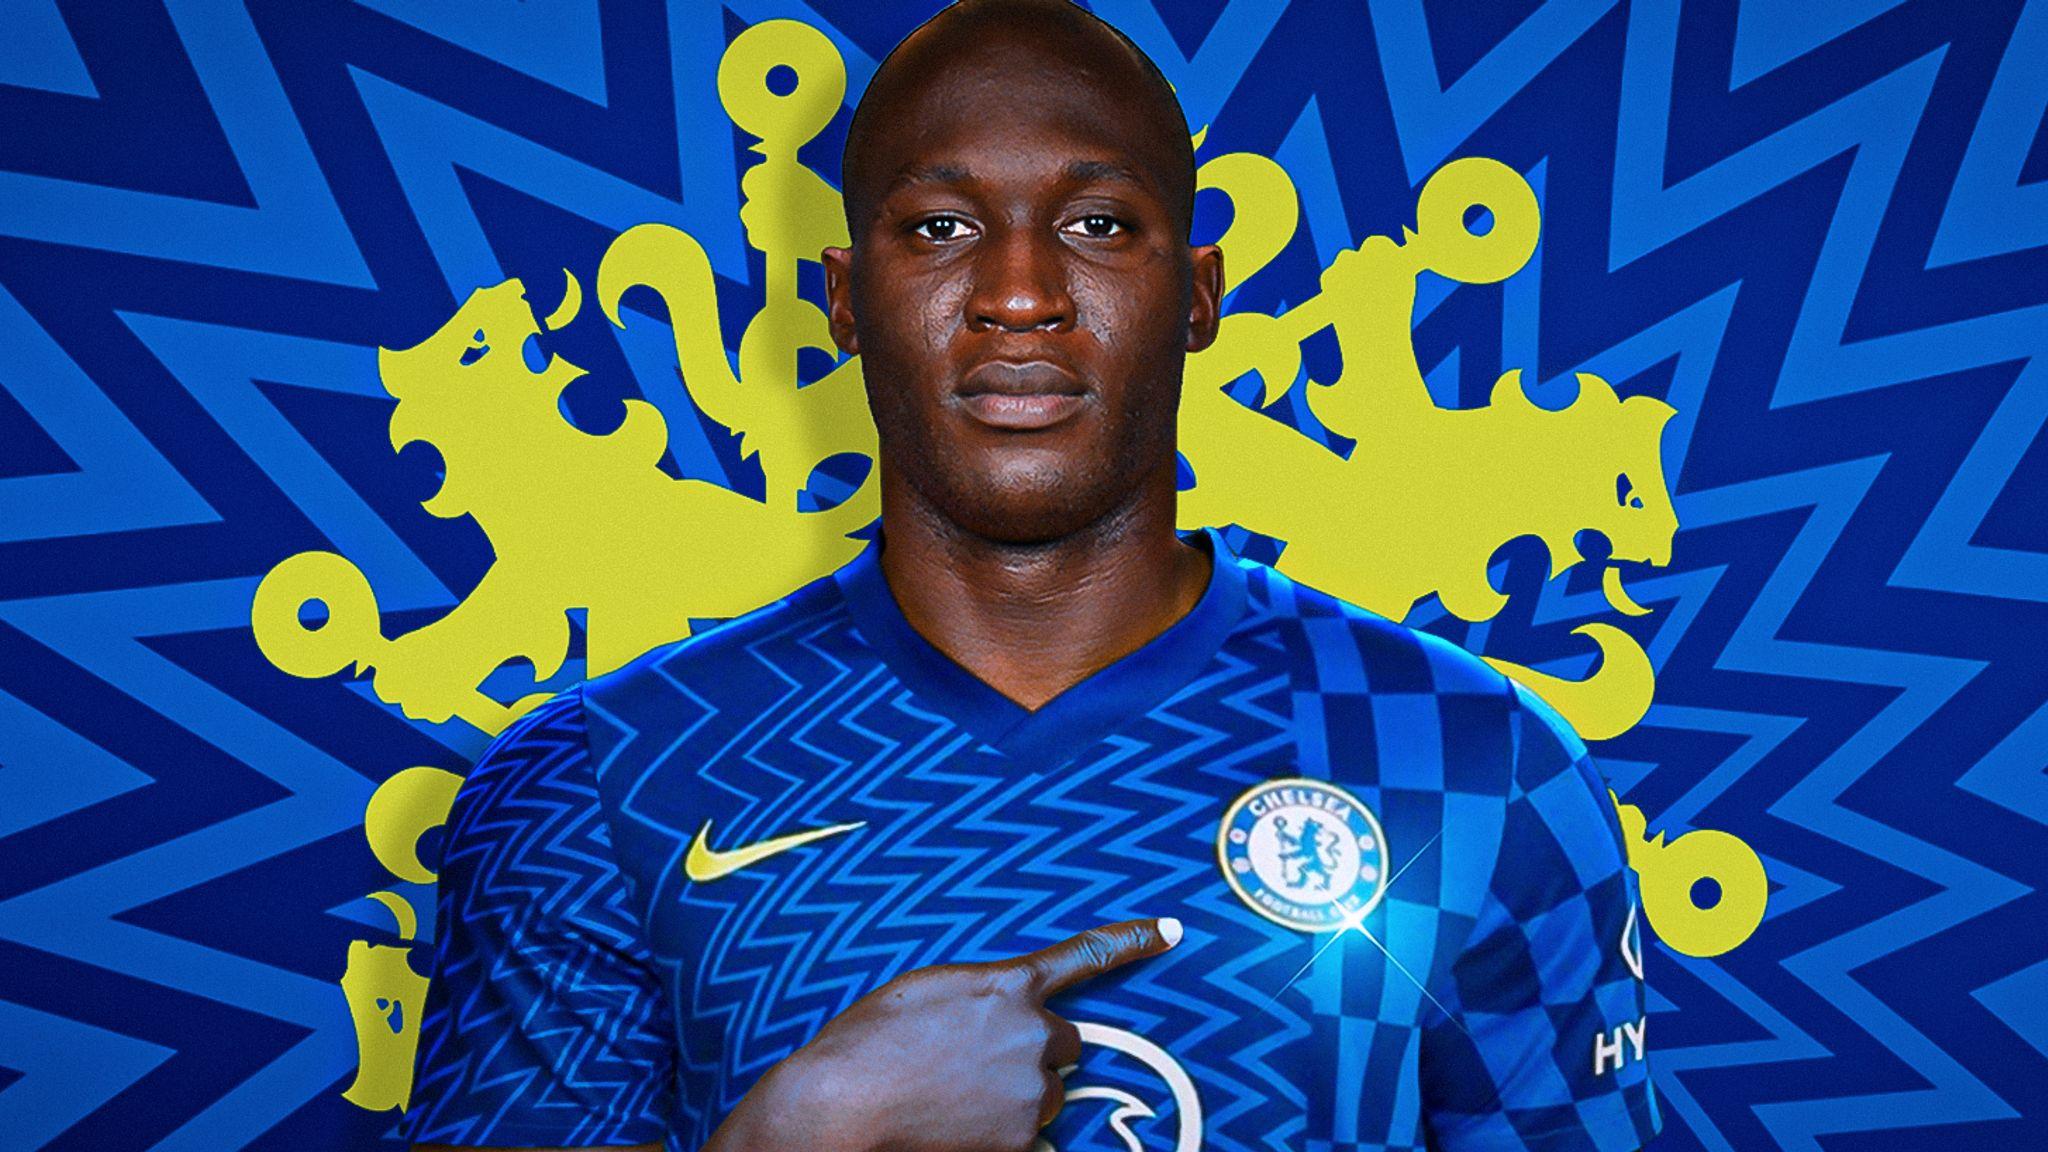 Chelsea Re-signs Belgium Star Romelu Lukaku on a Five-Year Deal